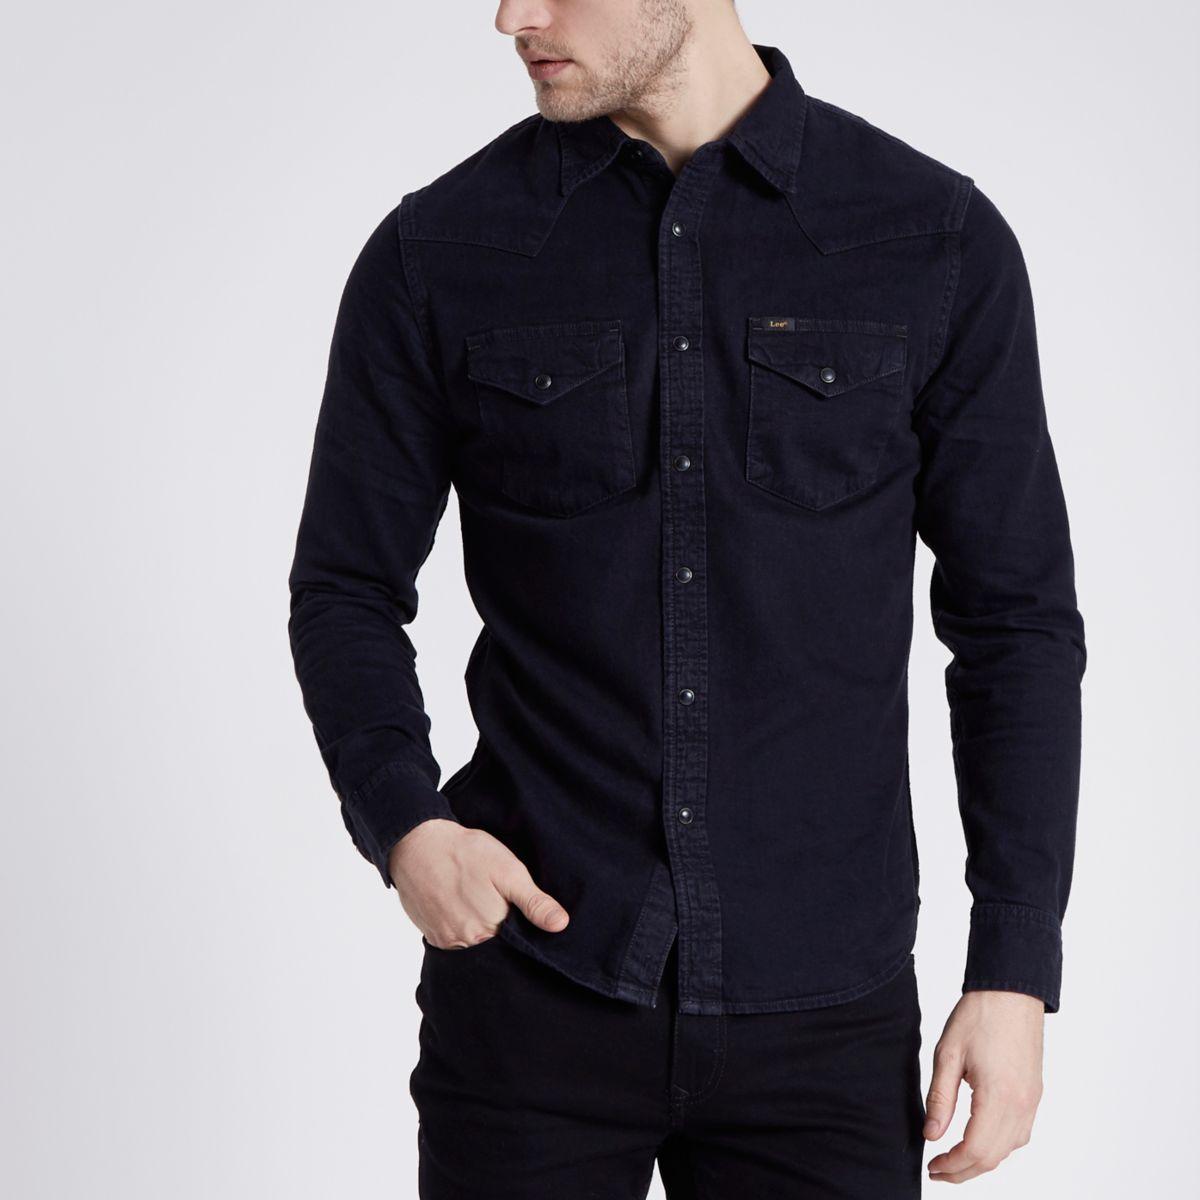 Lee - Zwart slim-fit denim western overhemd